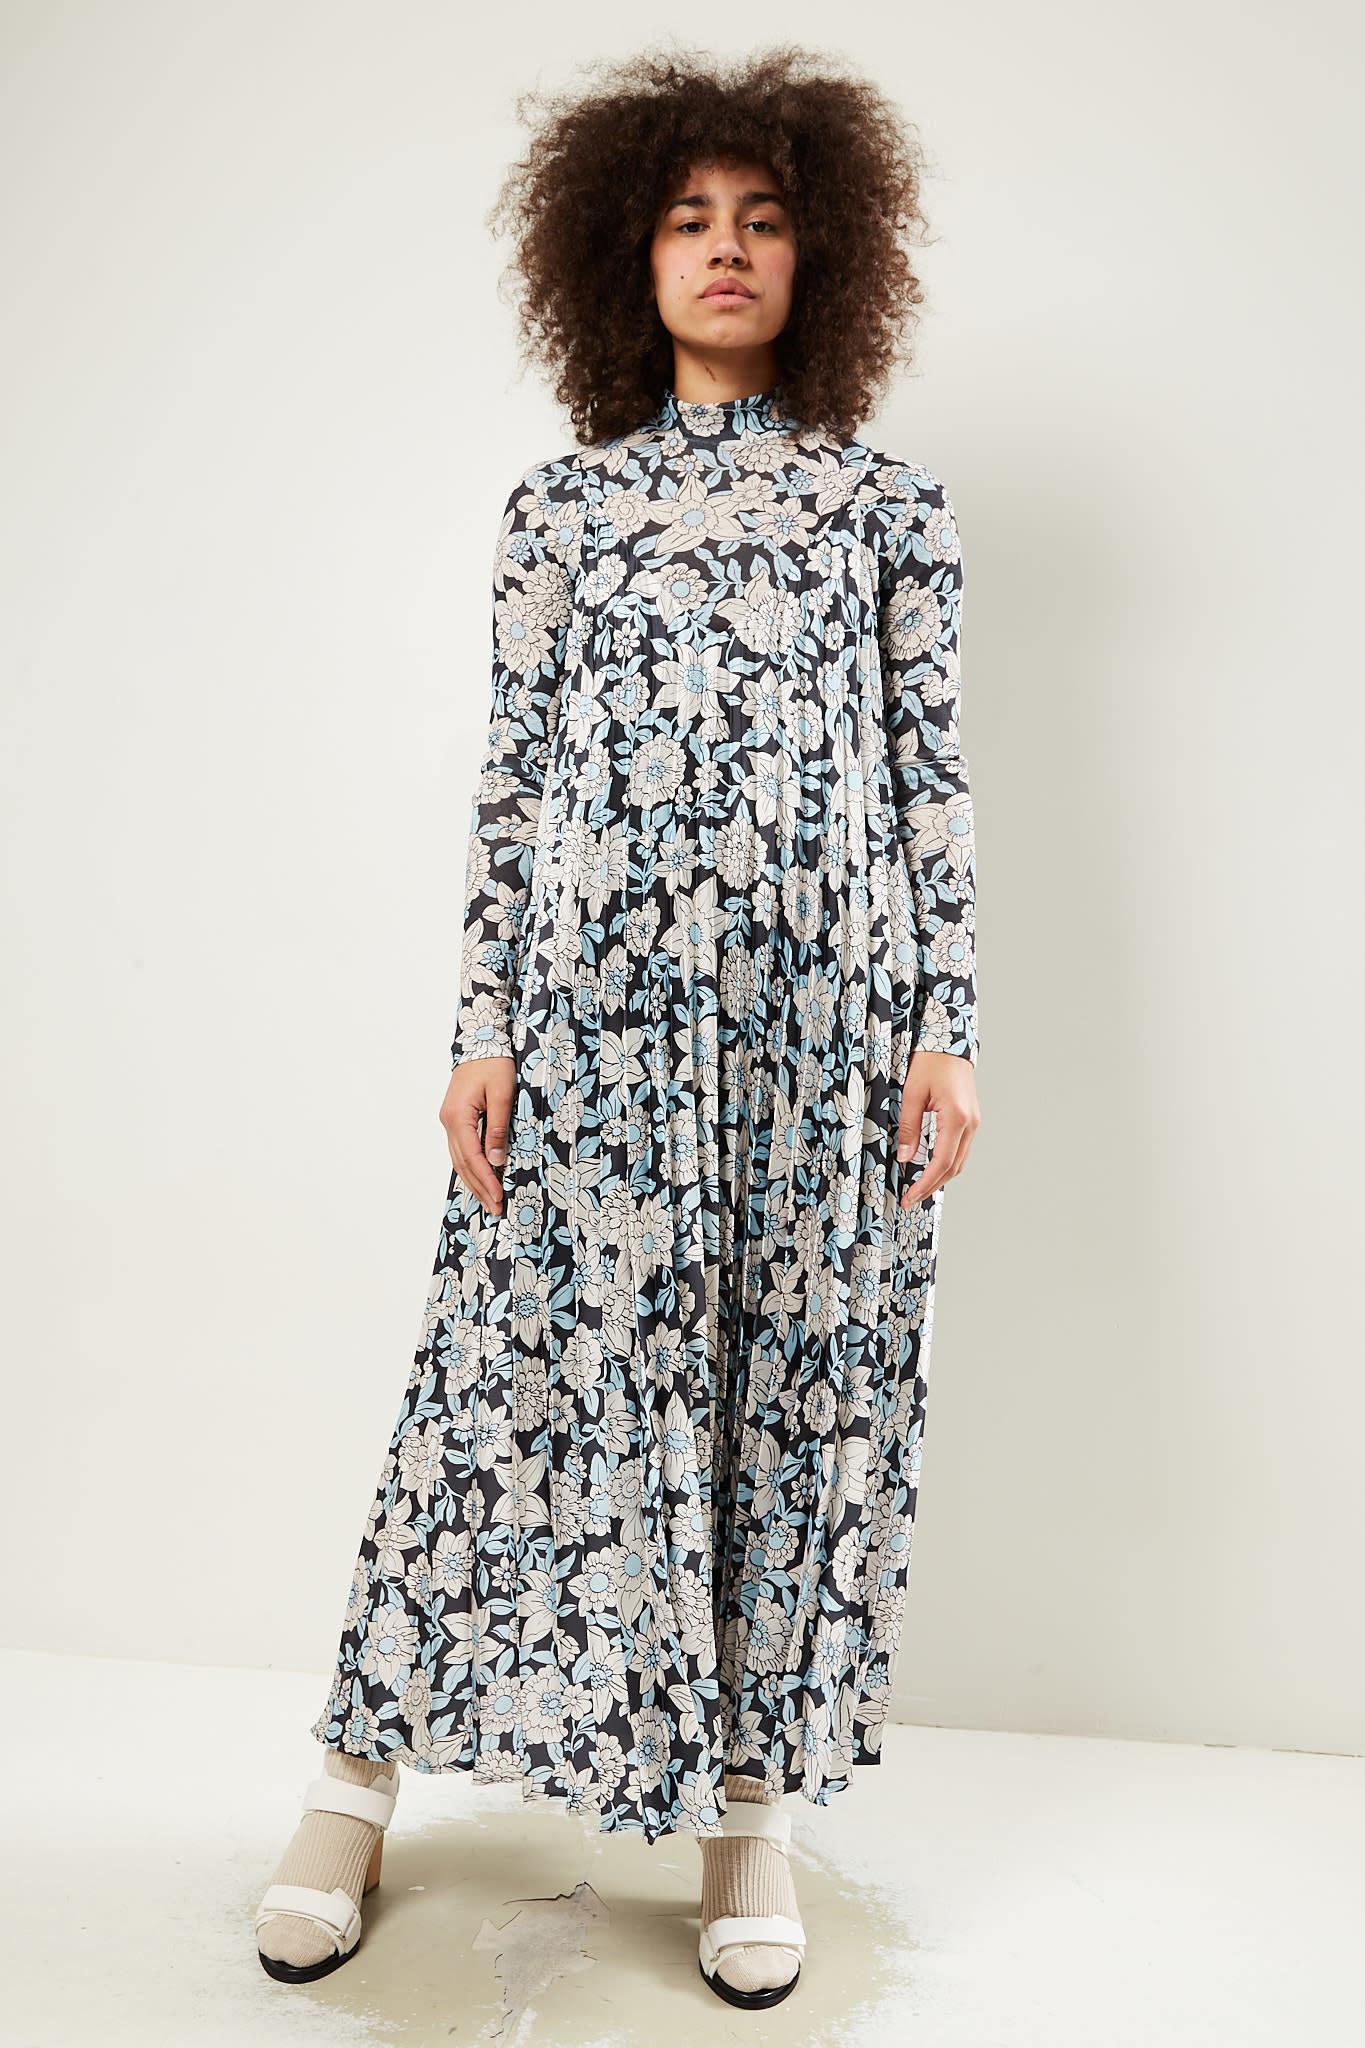 Christian Wijnants - Davit plisse dress